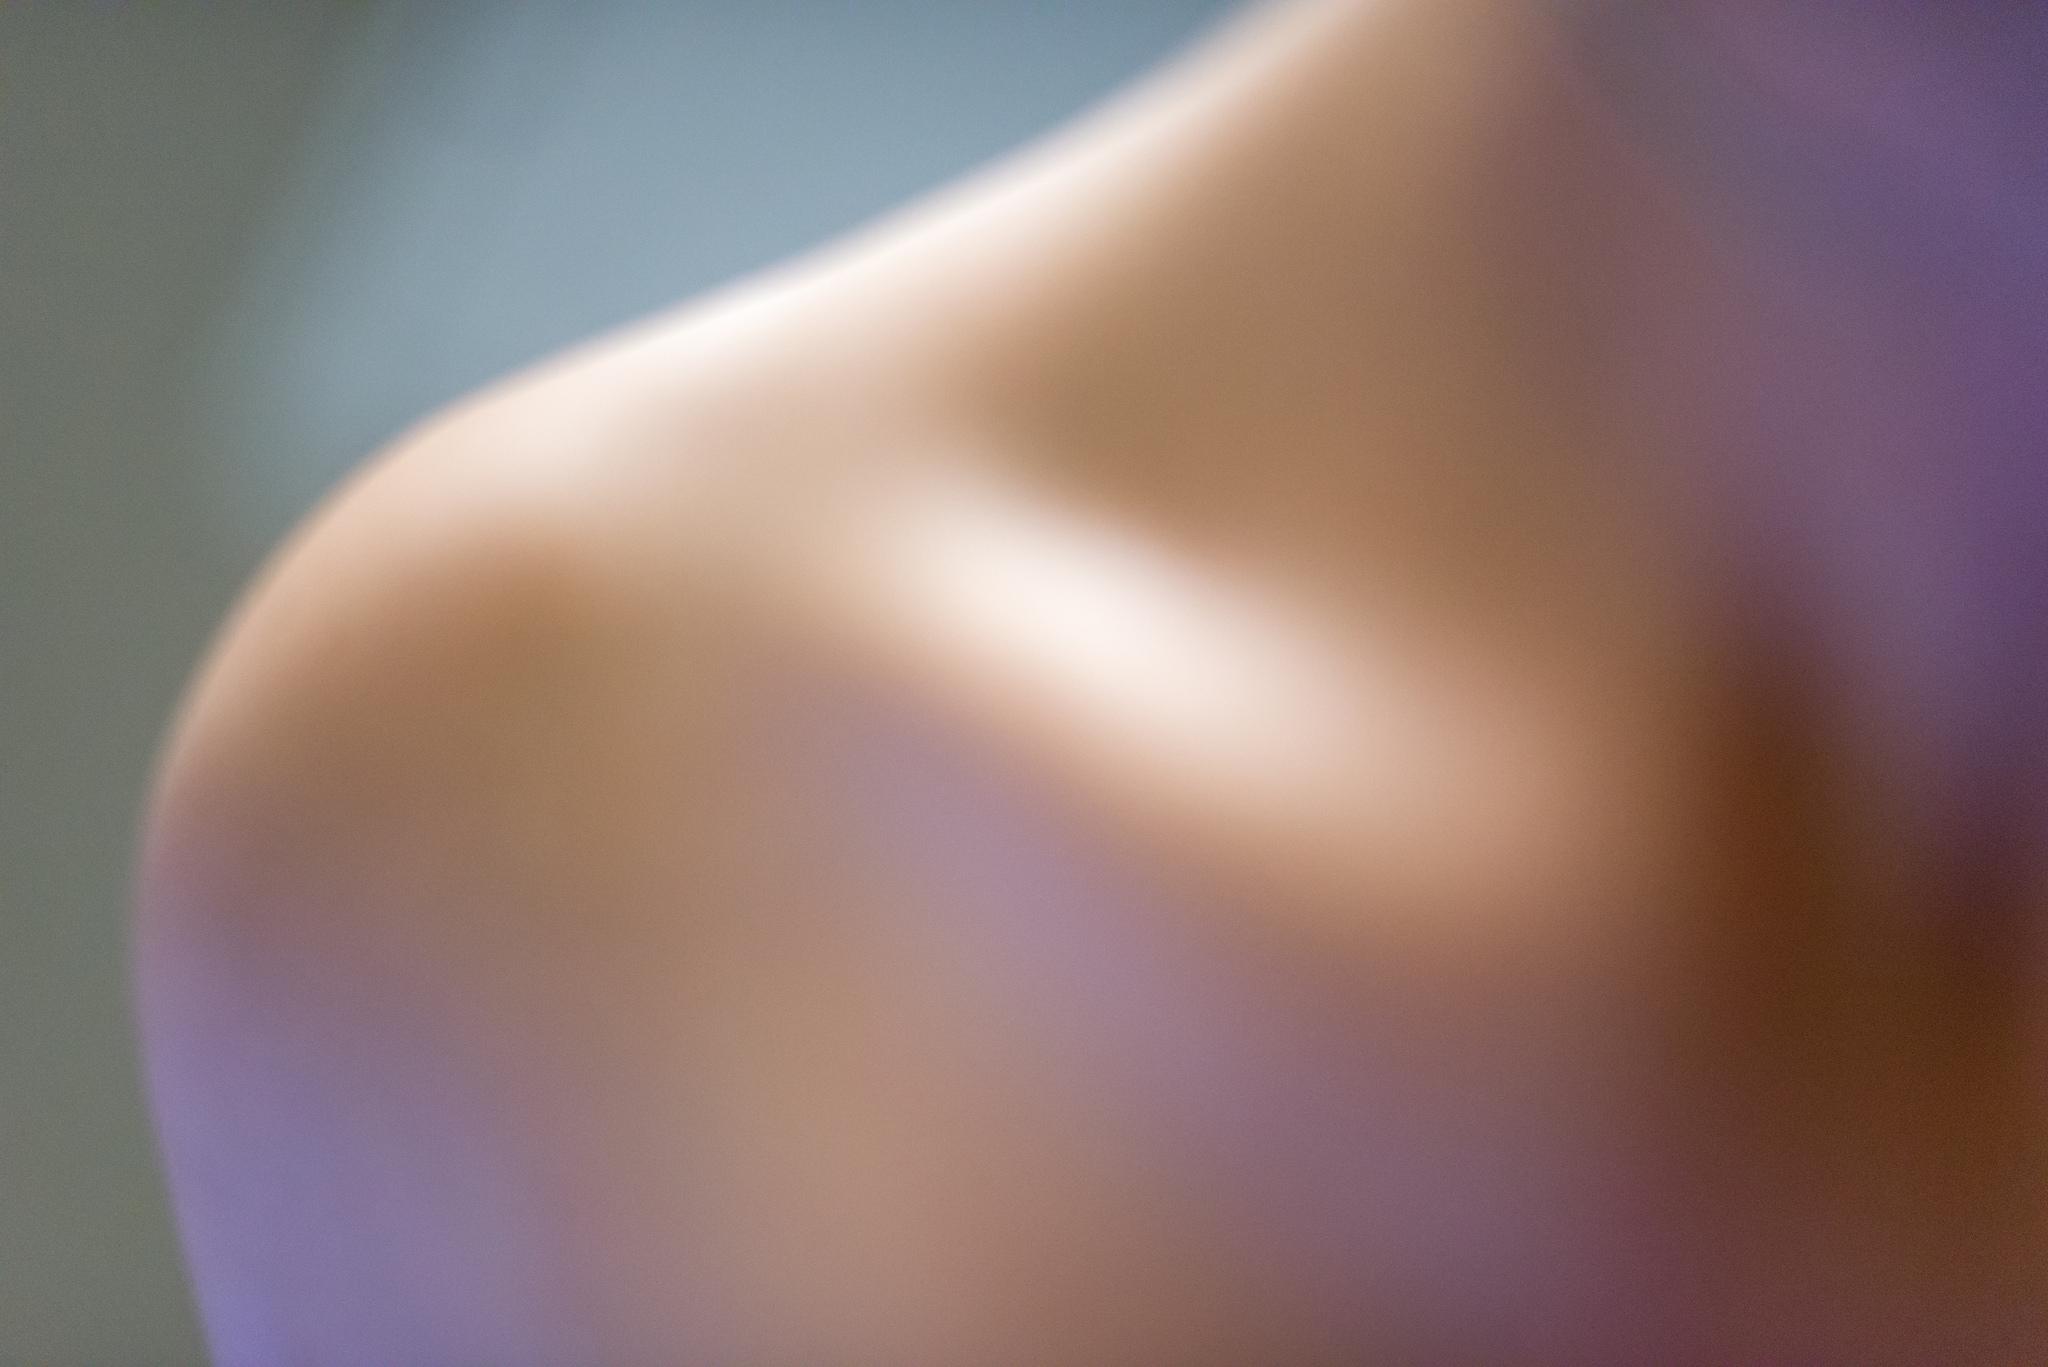 Porn Dutch dutch startup leakserv takes aim at revenge porn | techcrunch